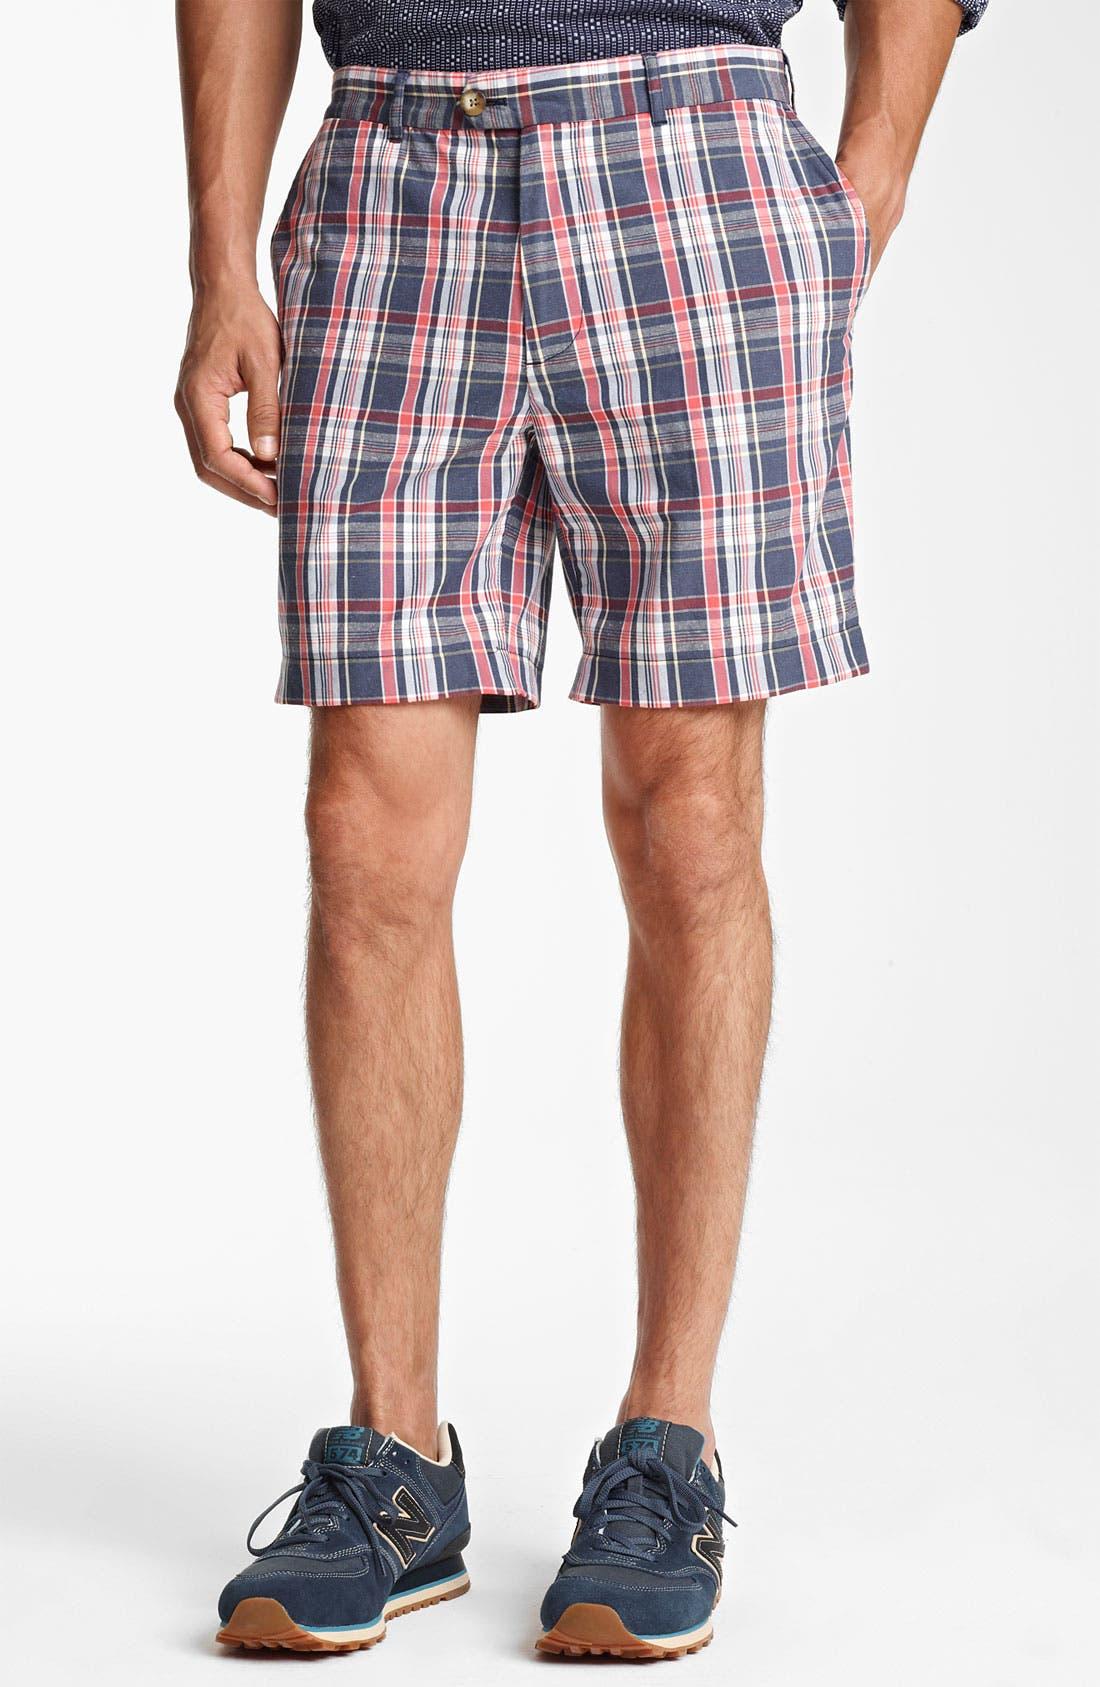 Alternate Image 1 Selected - Jack Spade 'Sharpe' Plaid Shorts